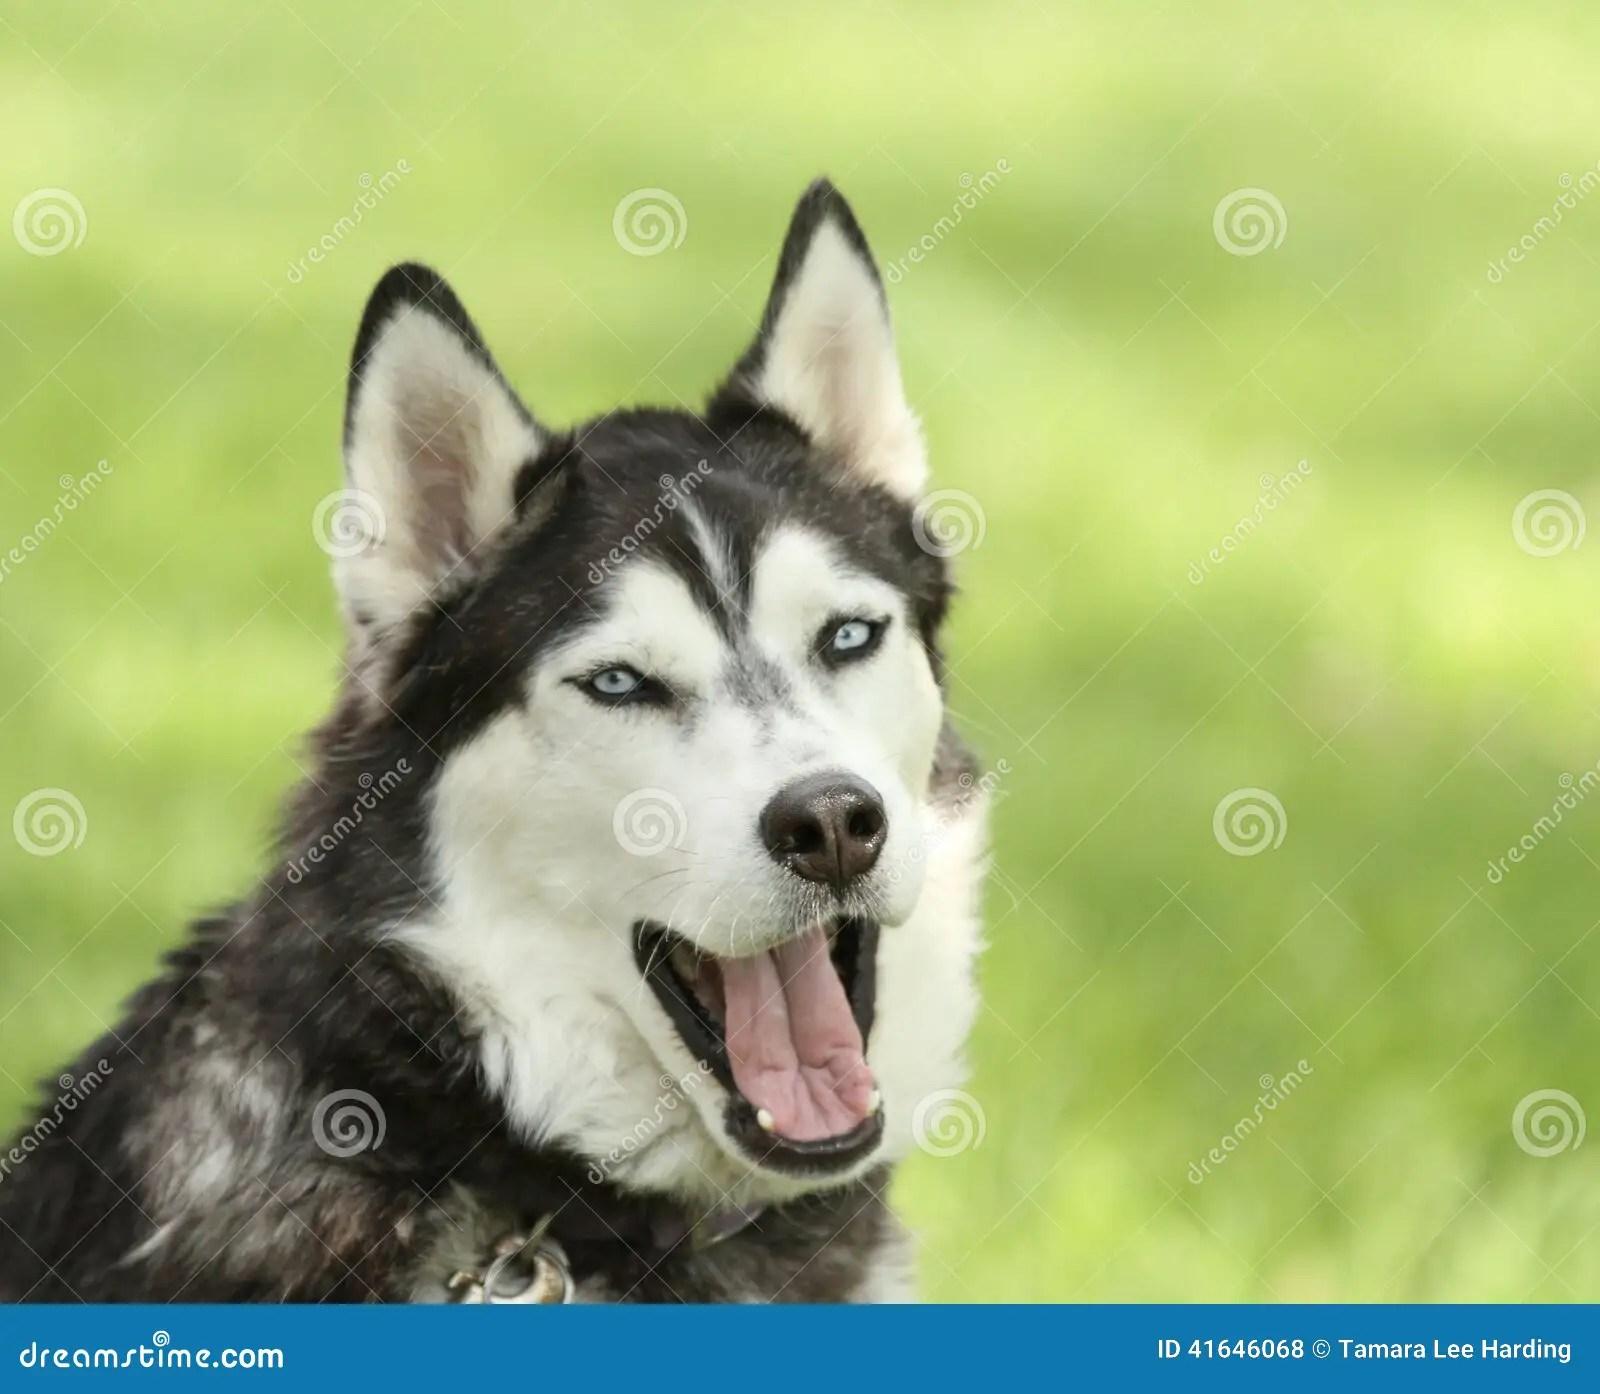 siberian husky with with